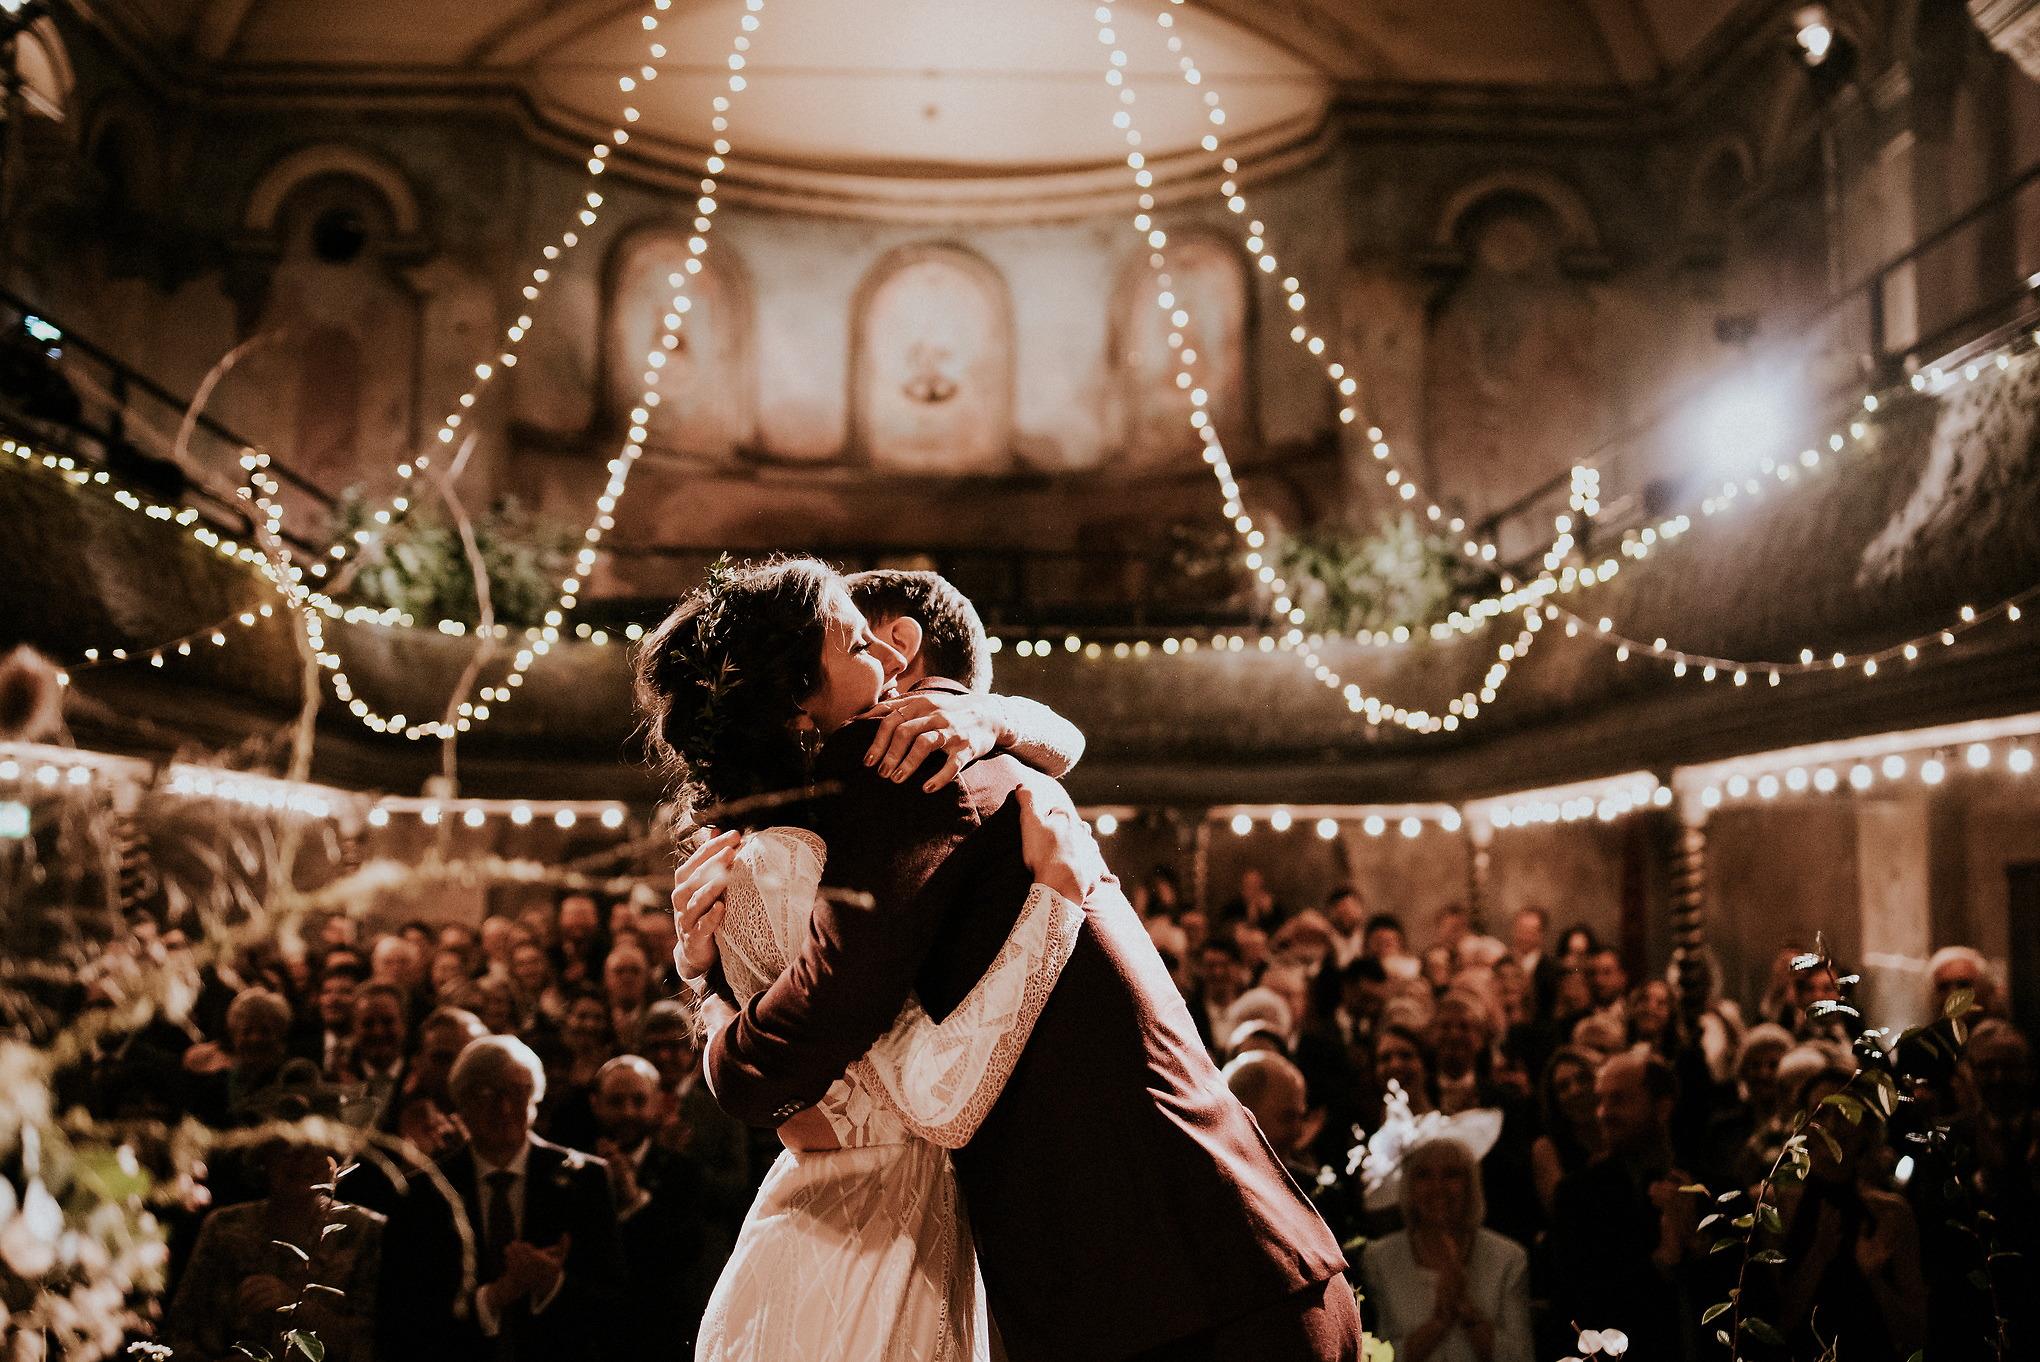 Sheffield Alternative Wedding Photographer | Leeds Alternative